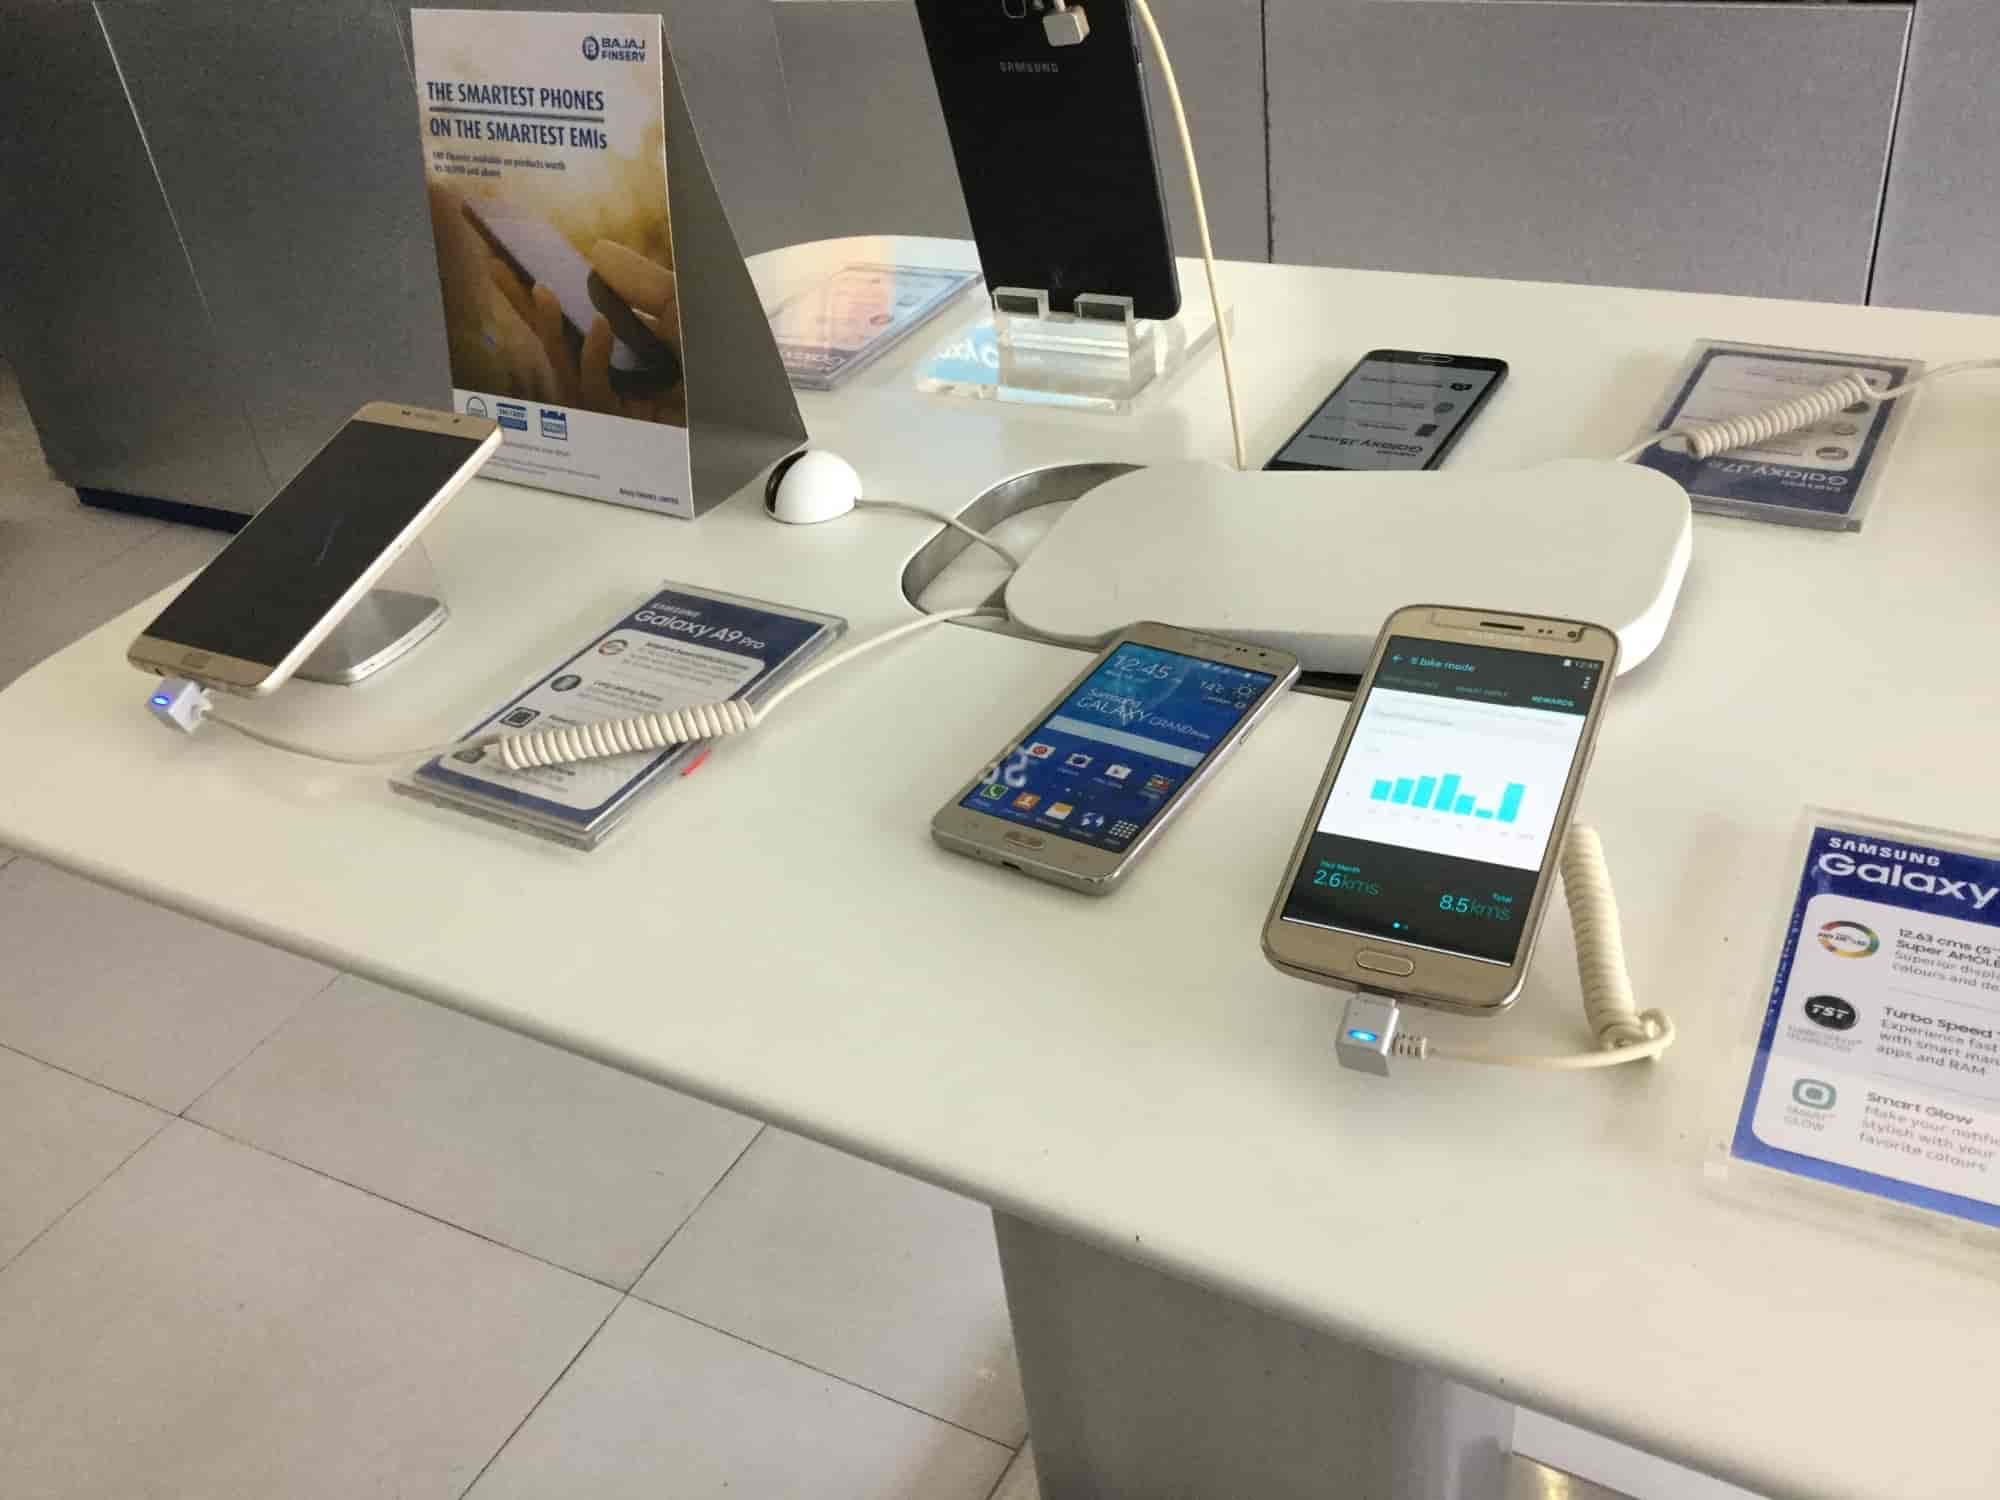 Samsung Smart Cafe, Dehradun City - Mobile Phone Dealers in